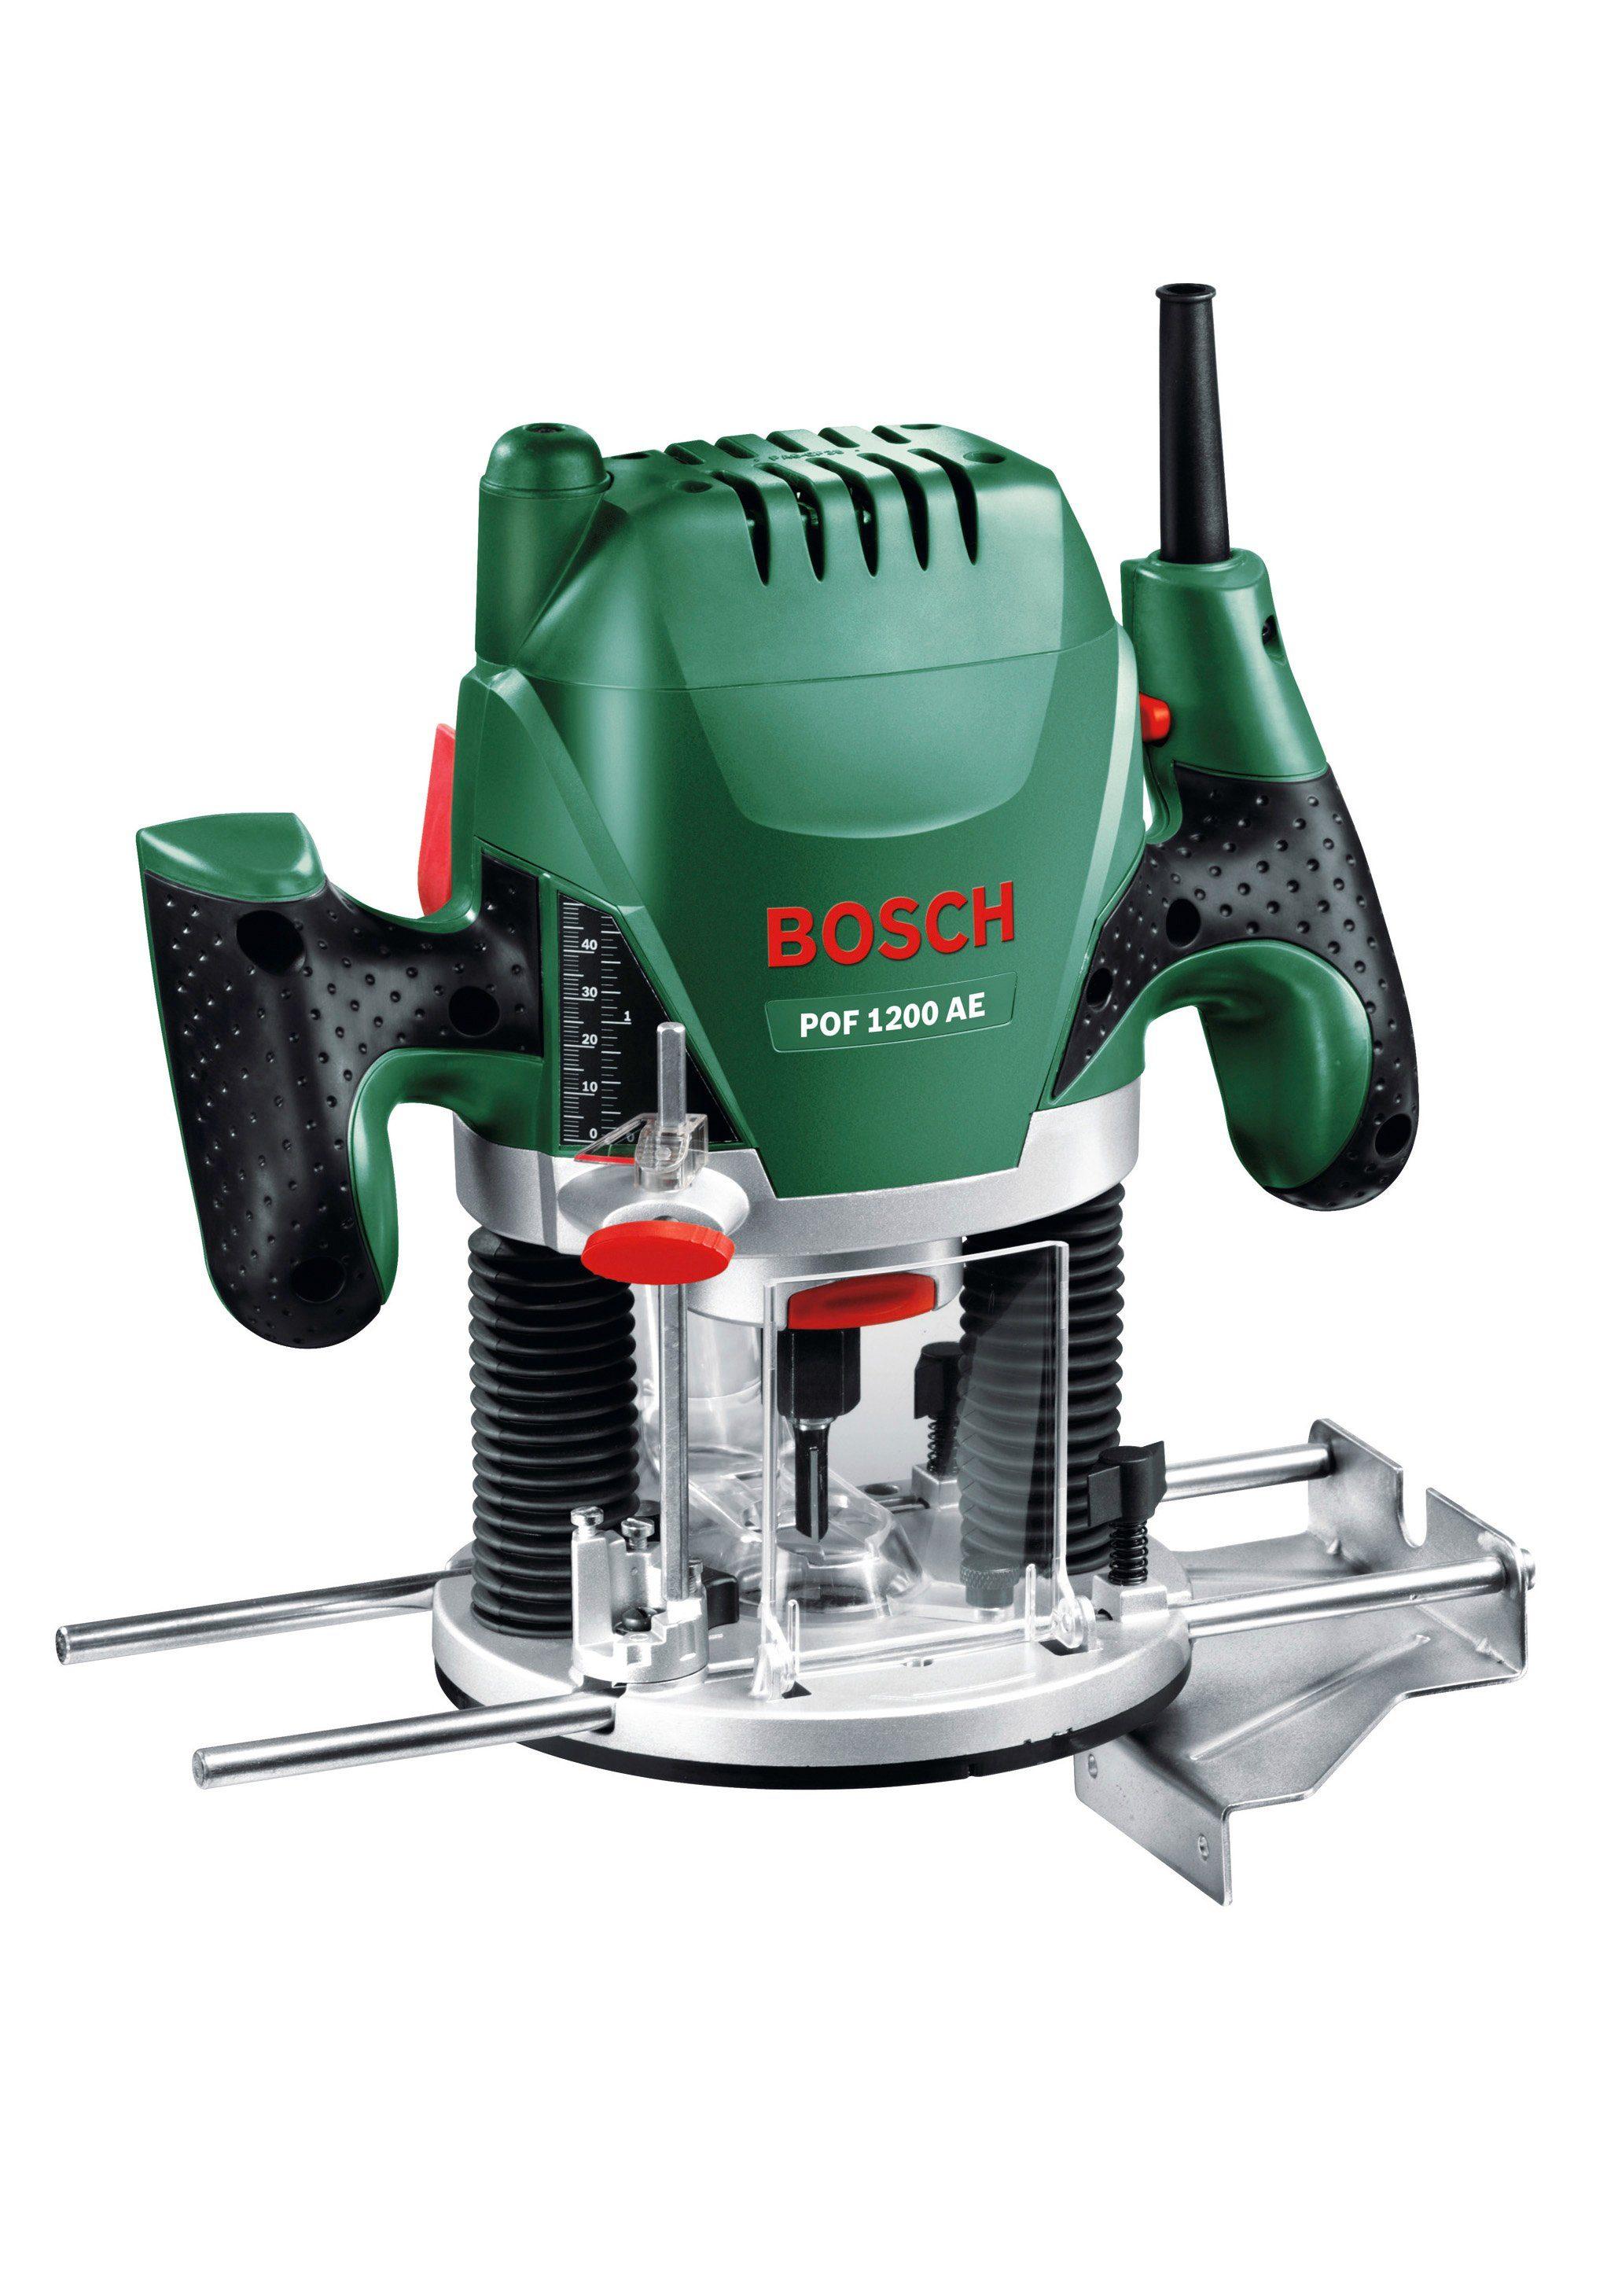 Bosch Oberfräse »POF 1200 AE«